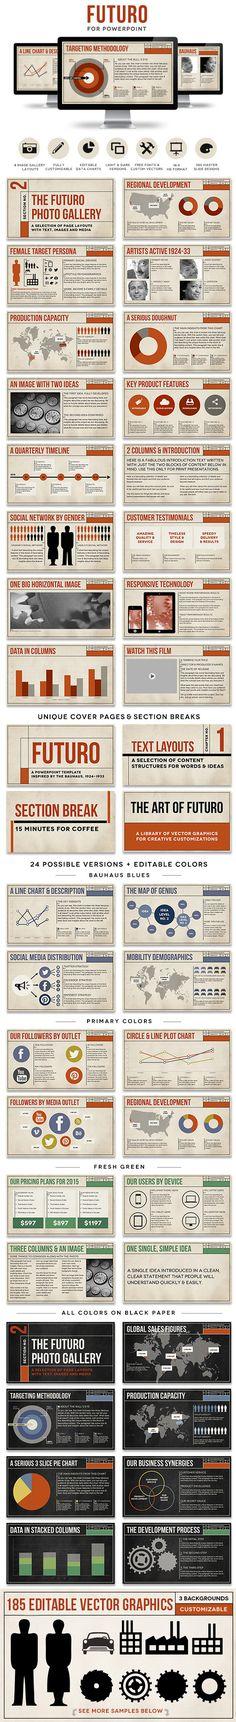 Futuro Powerpoint Presentation Template